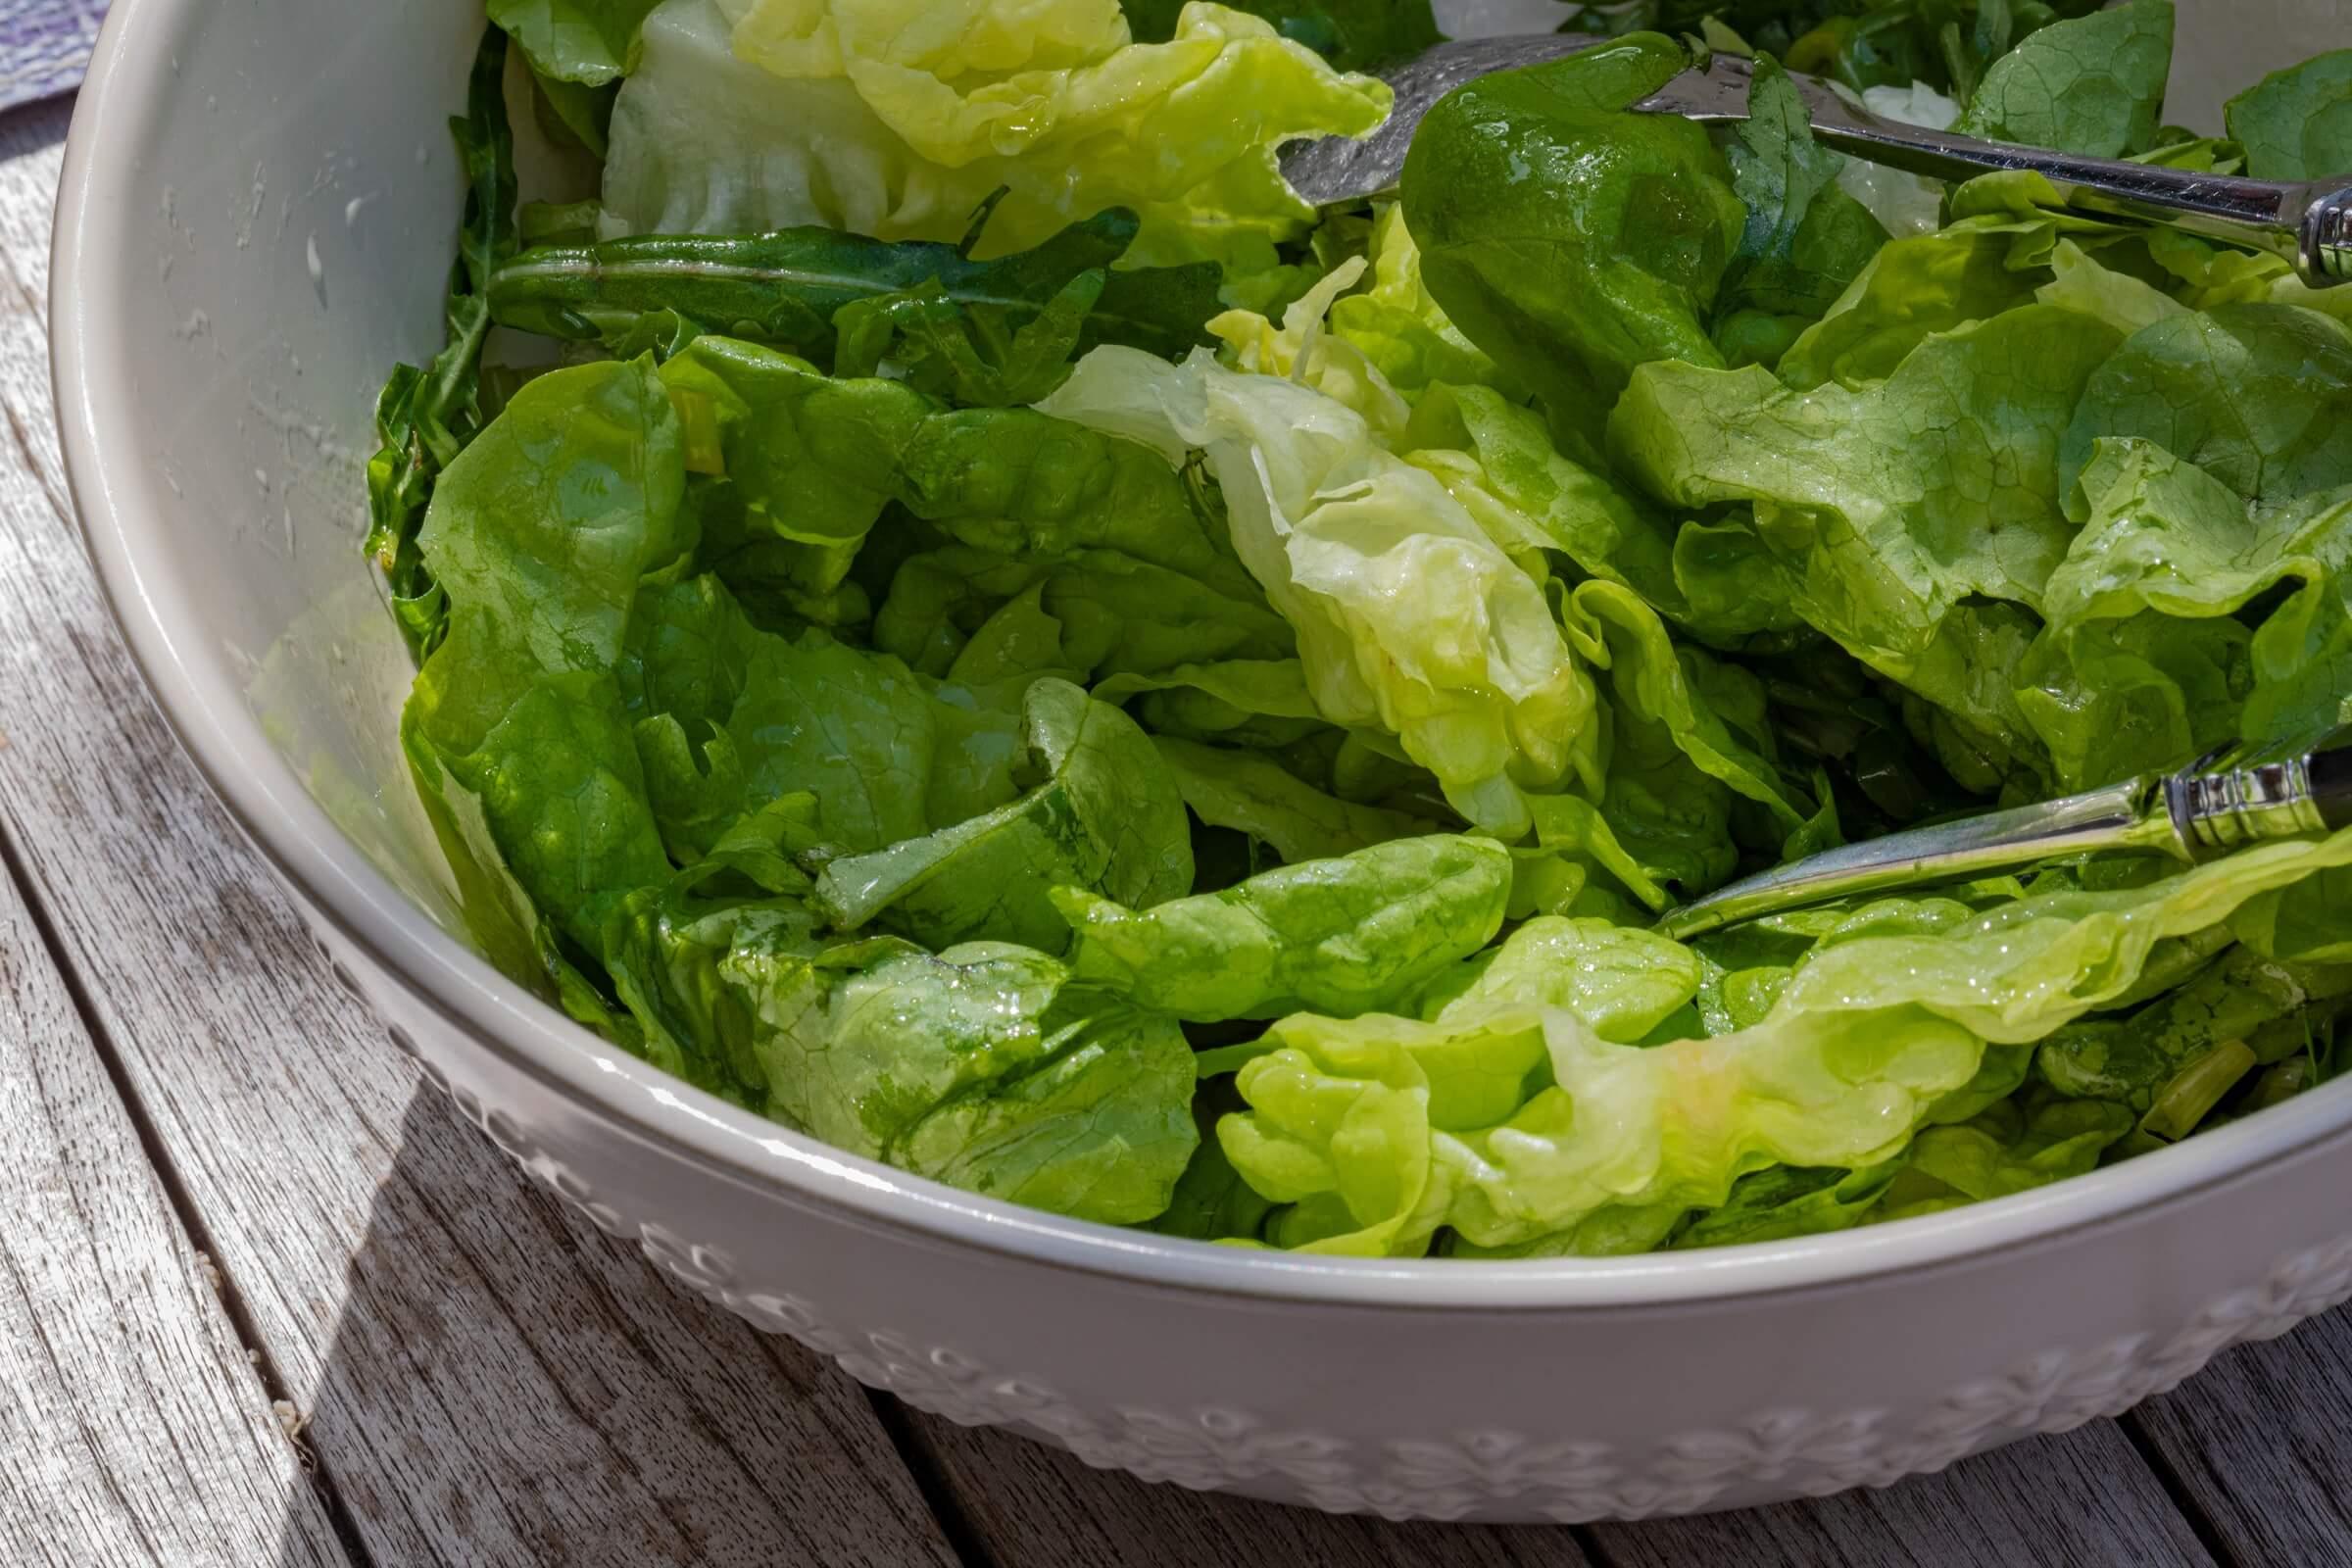 Lettuce leaves in a bowl